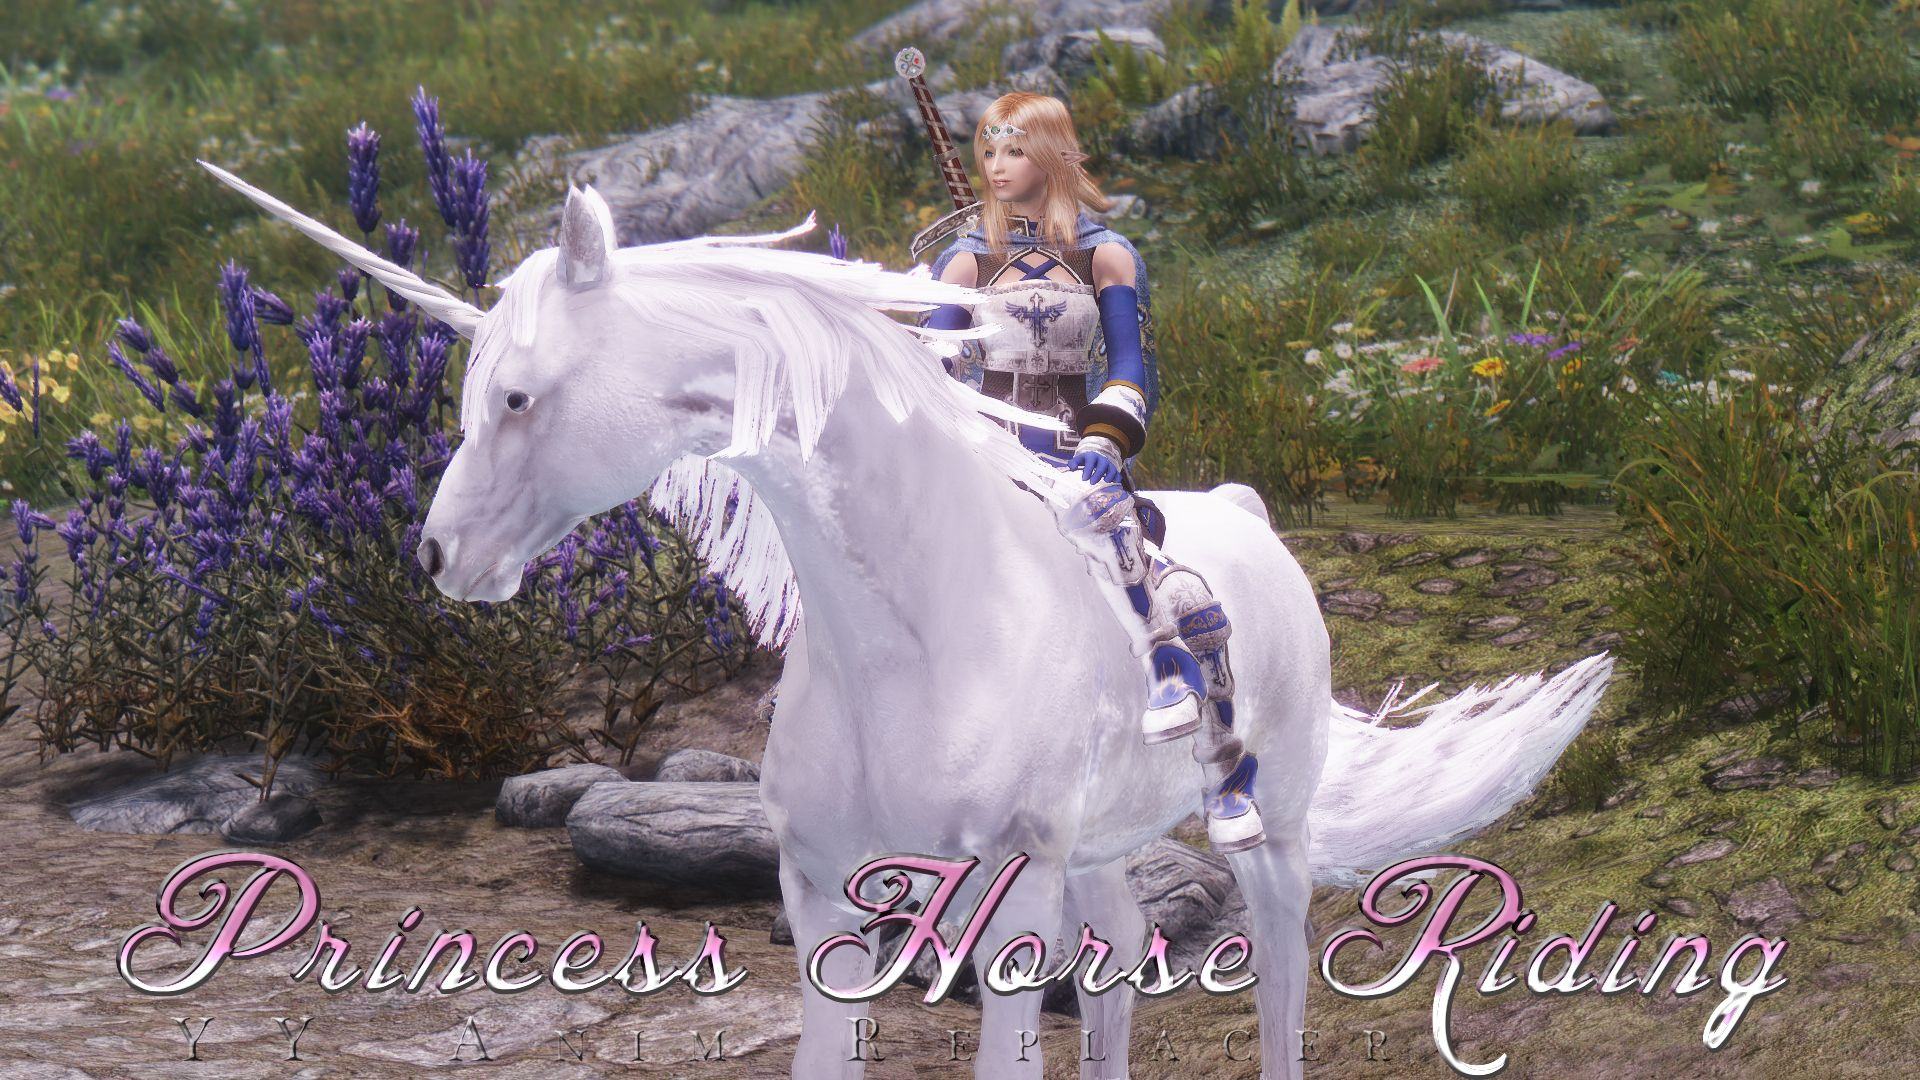 YY Anim Replacer - Princess Horse Riding by yukl @ nexusmods